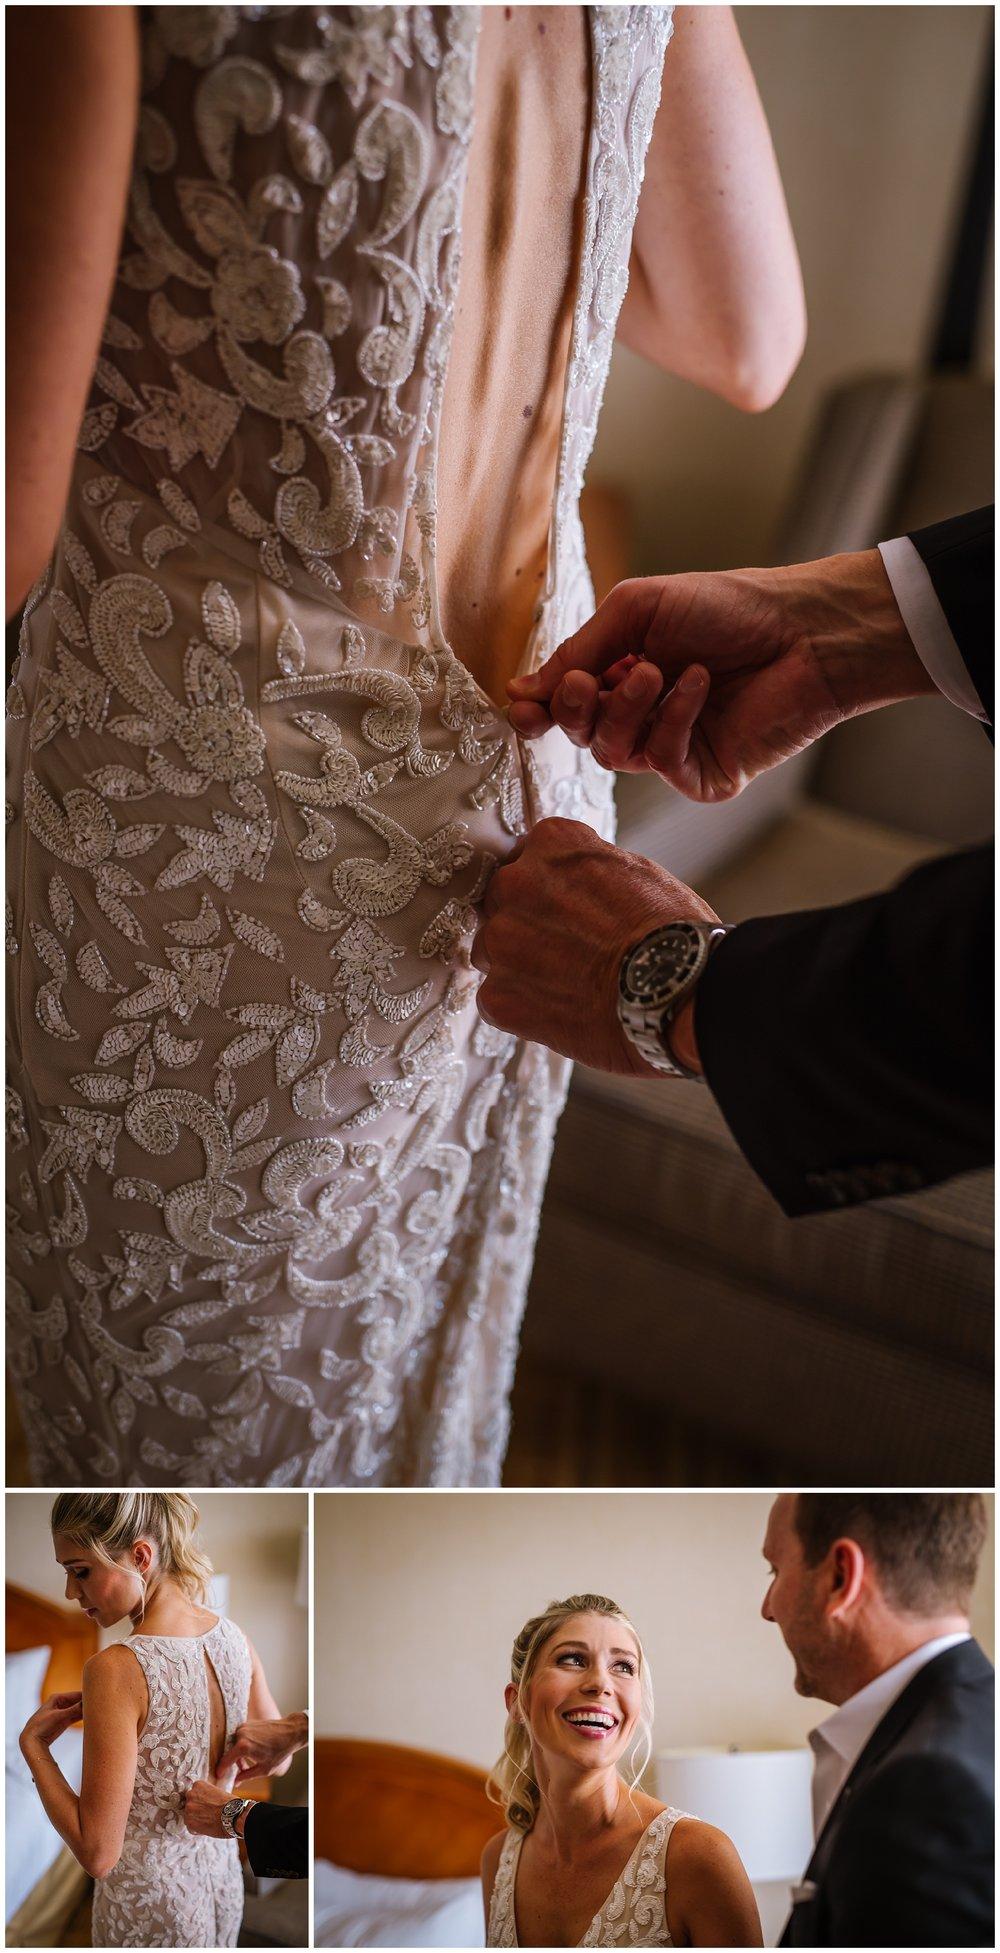 Tampa-wedding-photographer-downtown-bhldn-intimate_0010.jpg